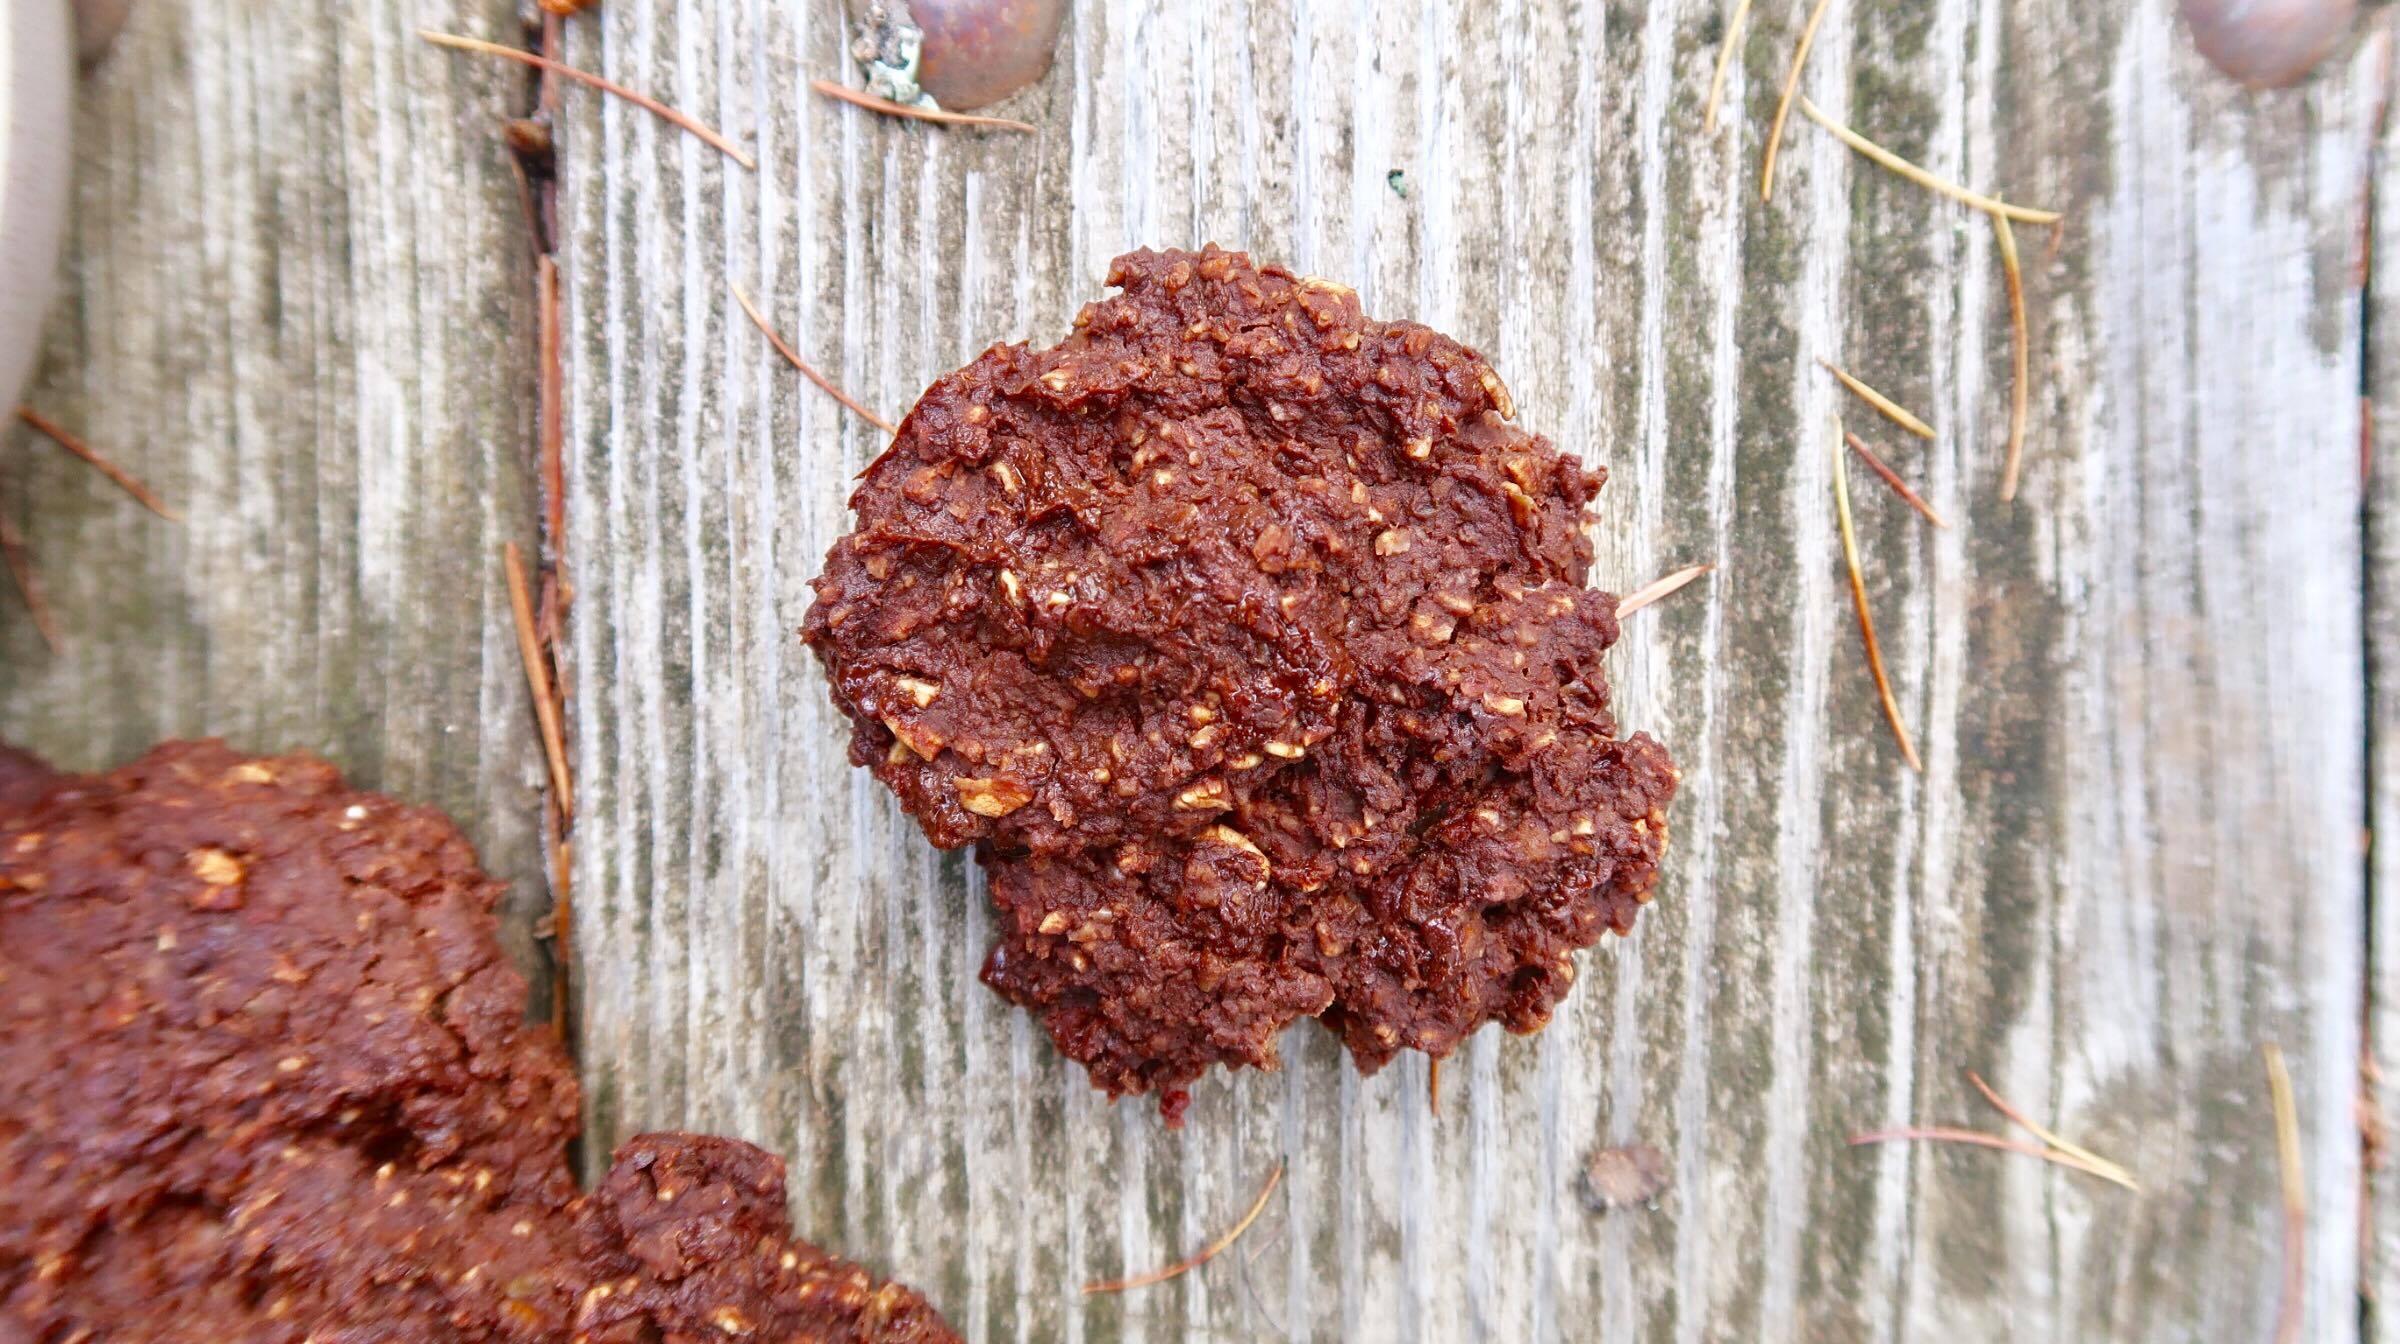 nutritious-chocolate-chip-cookie-single cookie.jpg